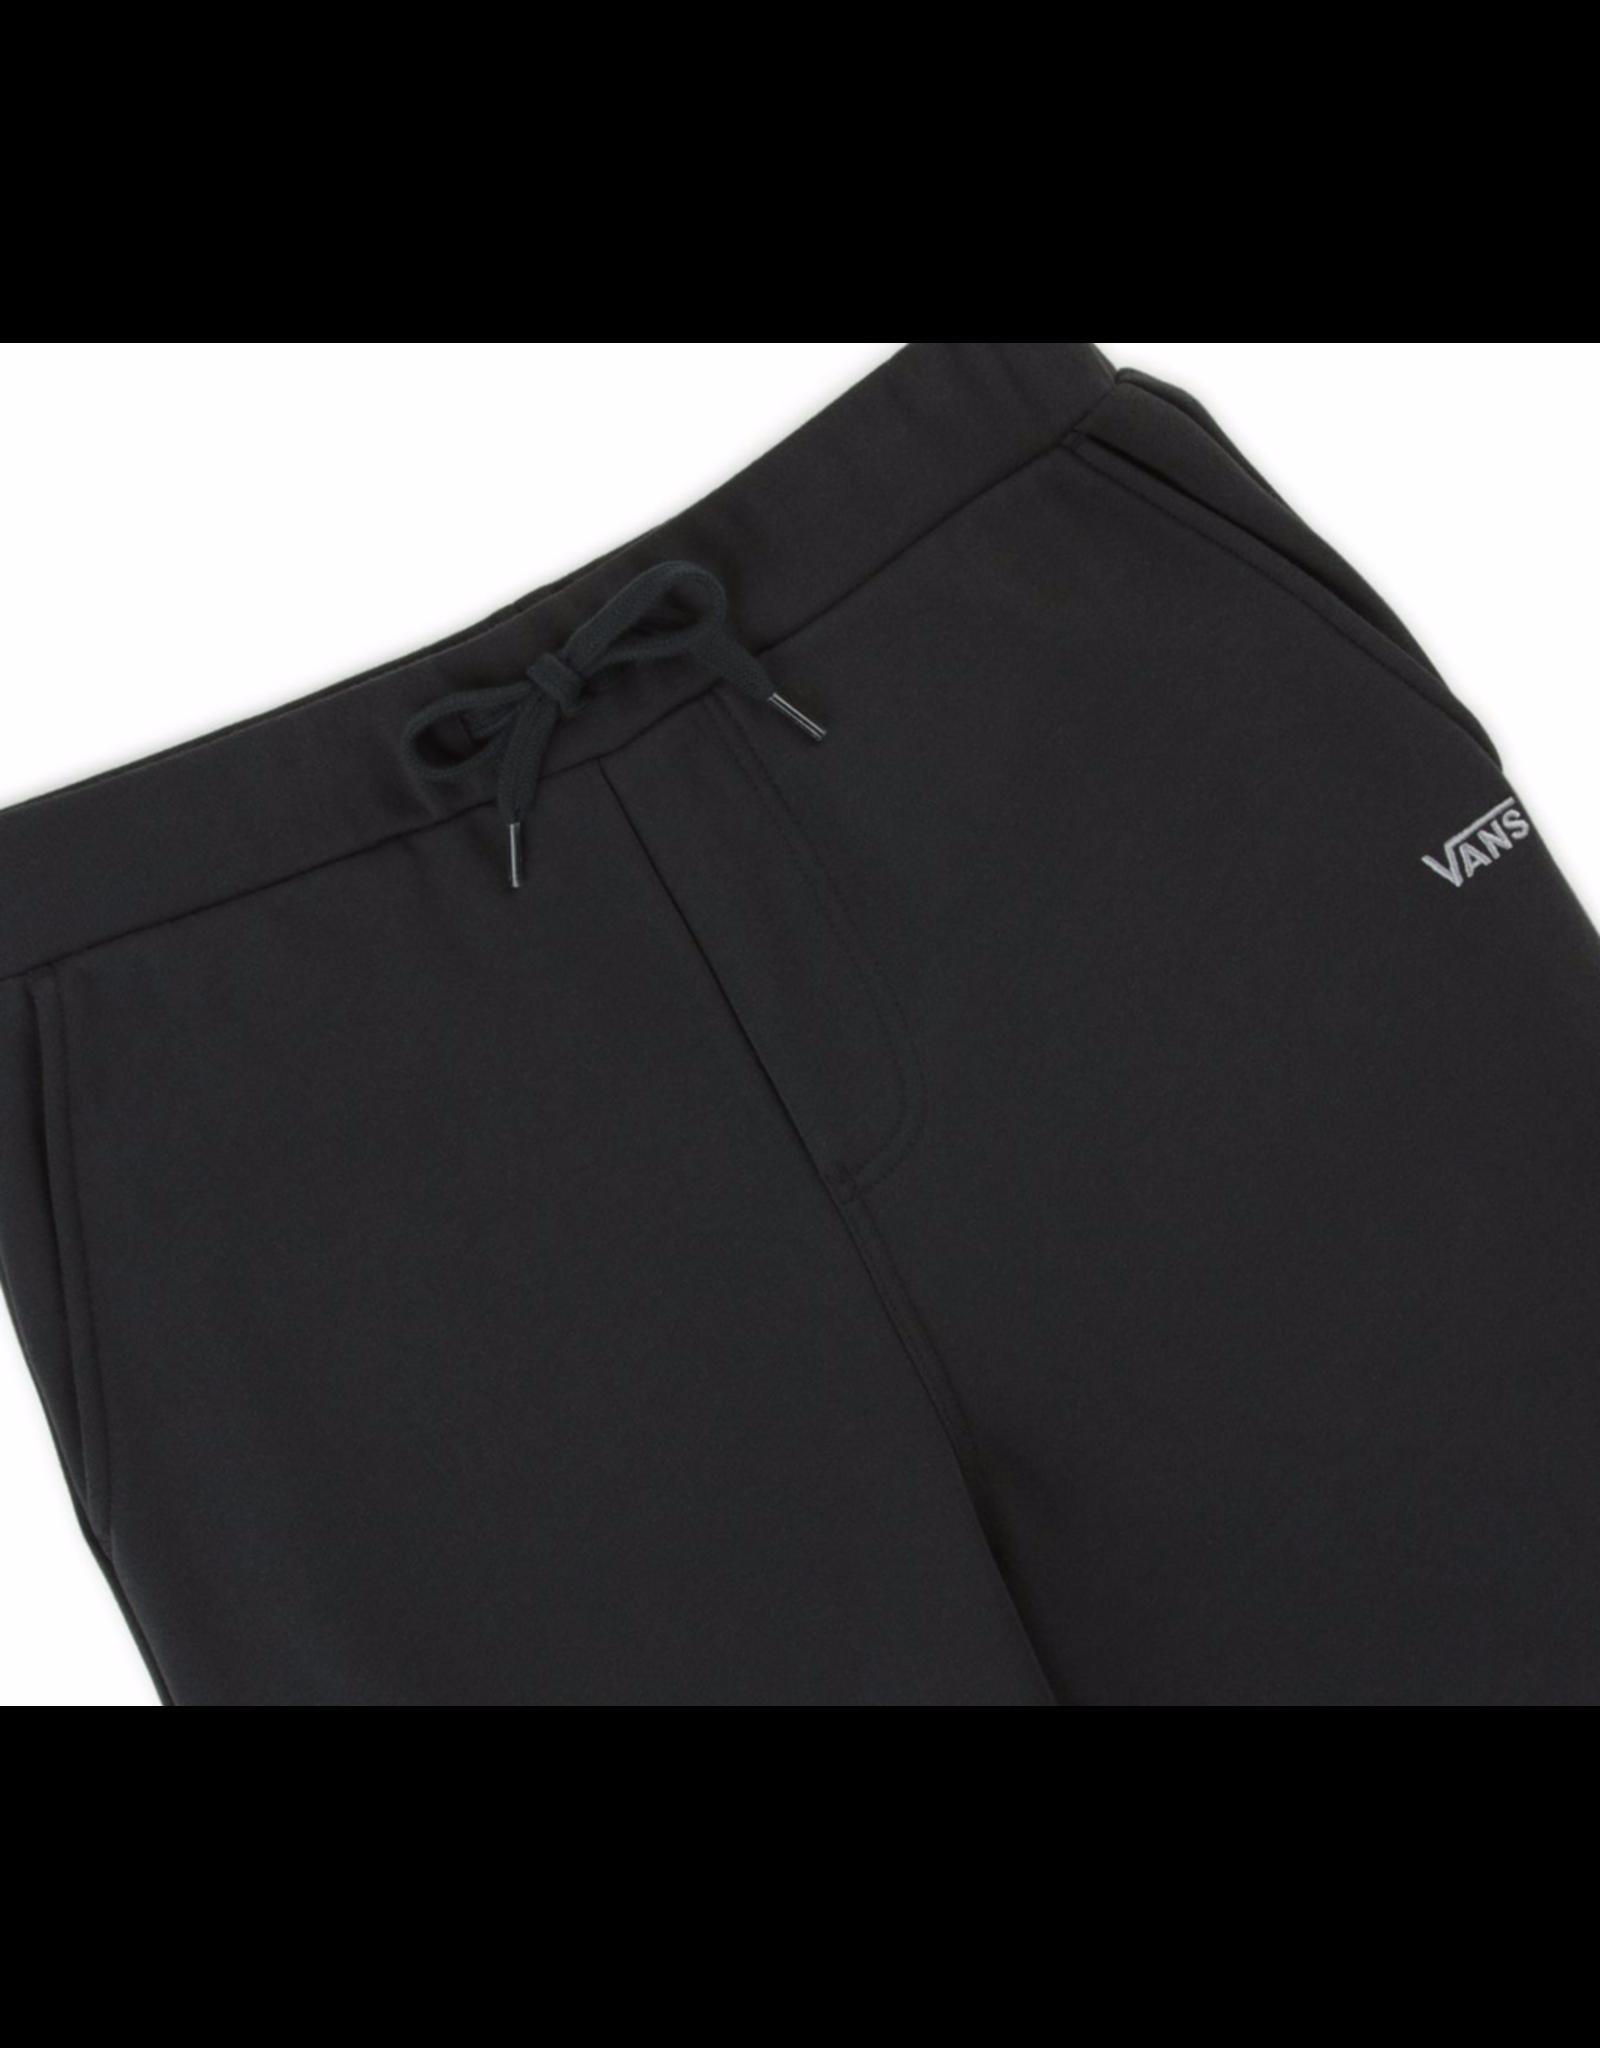 Vans Basic Fleece Pant